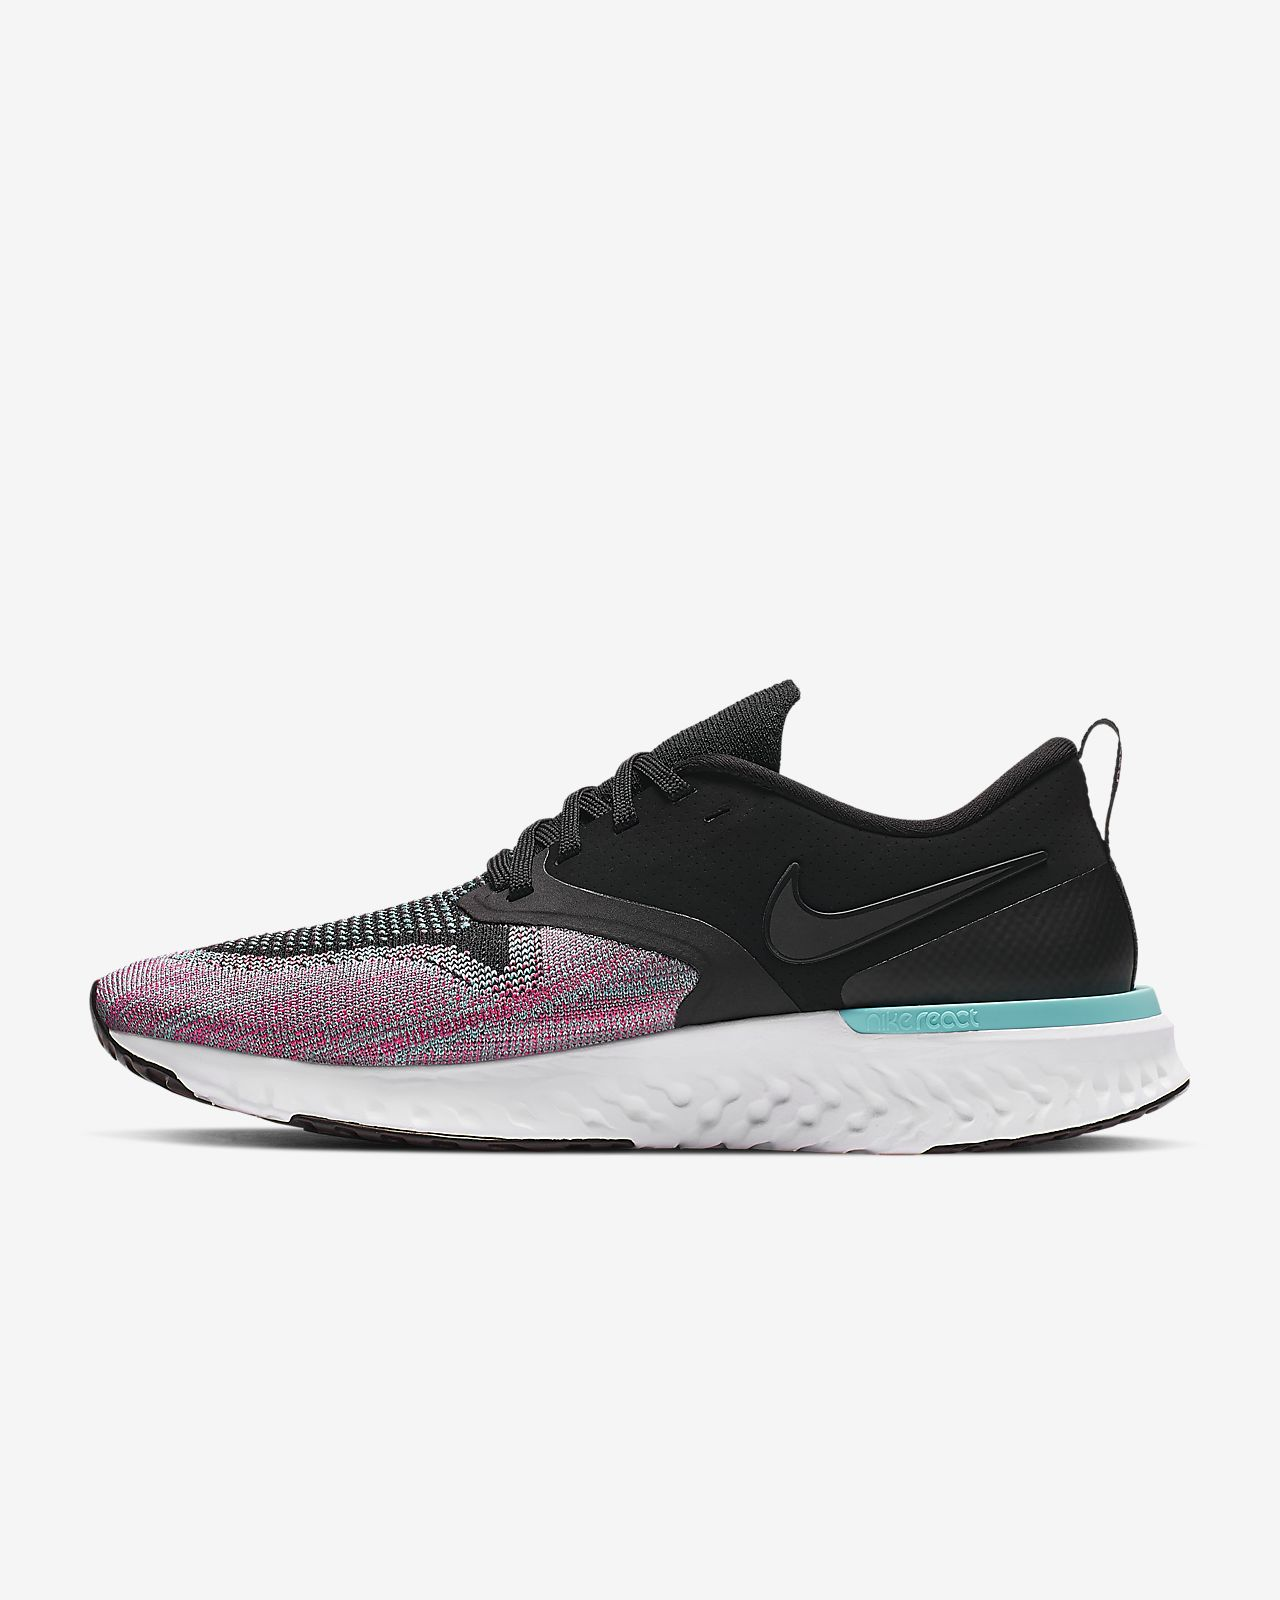 Nike Odyssey React women's running shoes · Nike · Sport · El